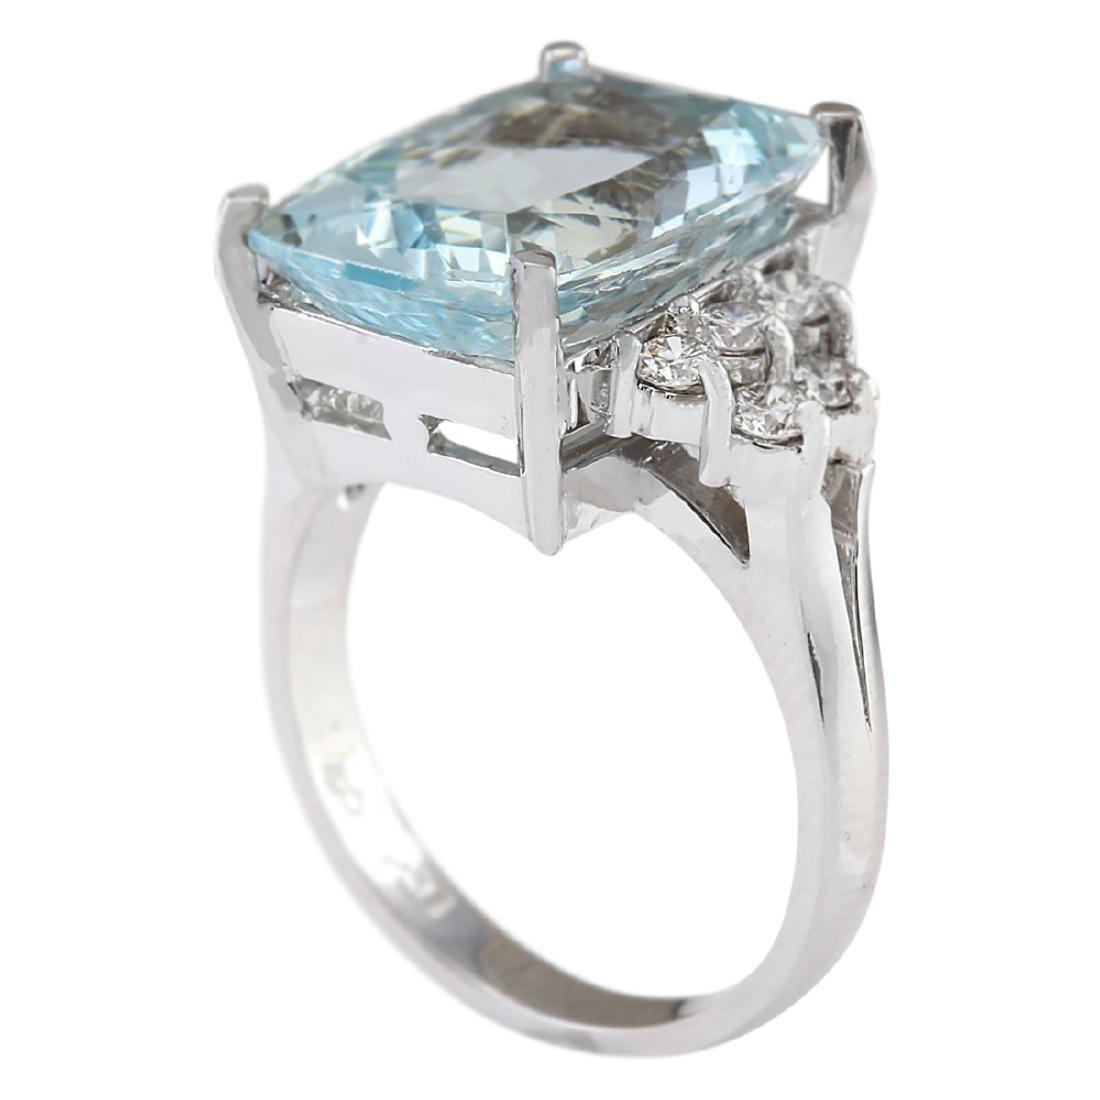 8.13 CTW Natural Aquamarine And Diamond Ring In 18K - 3